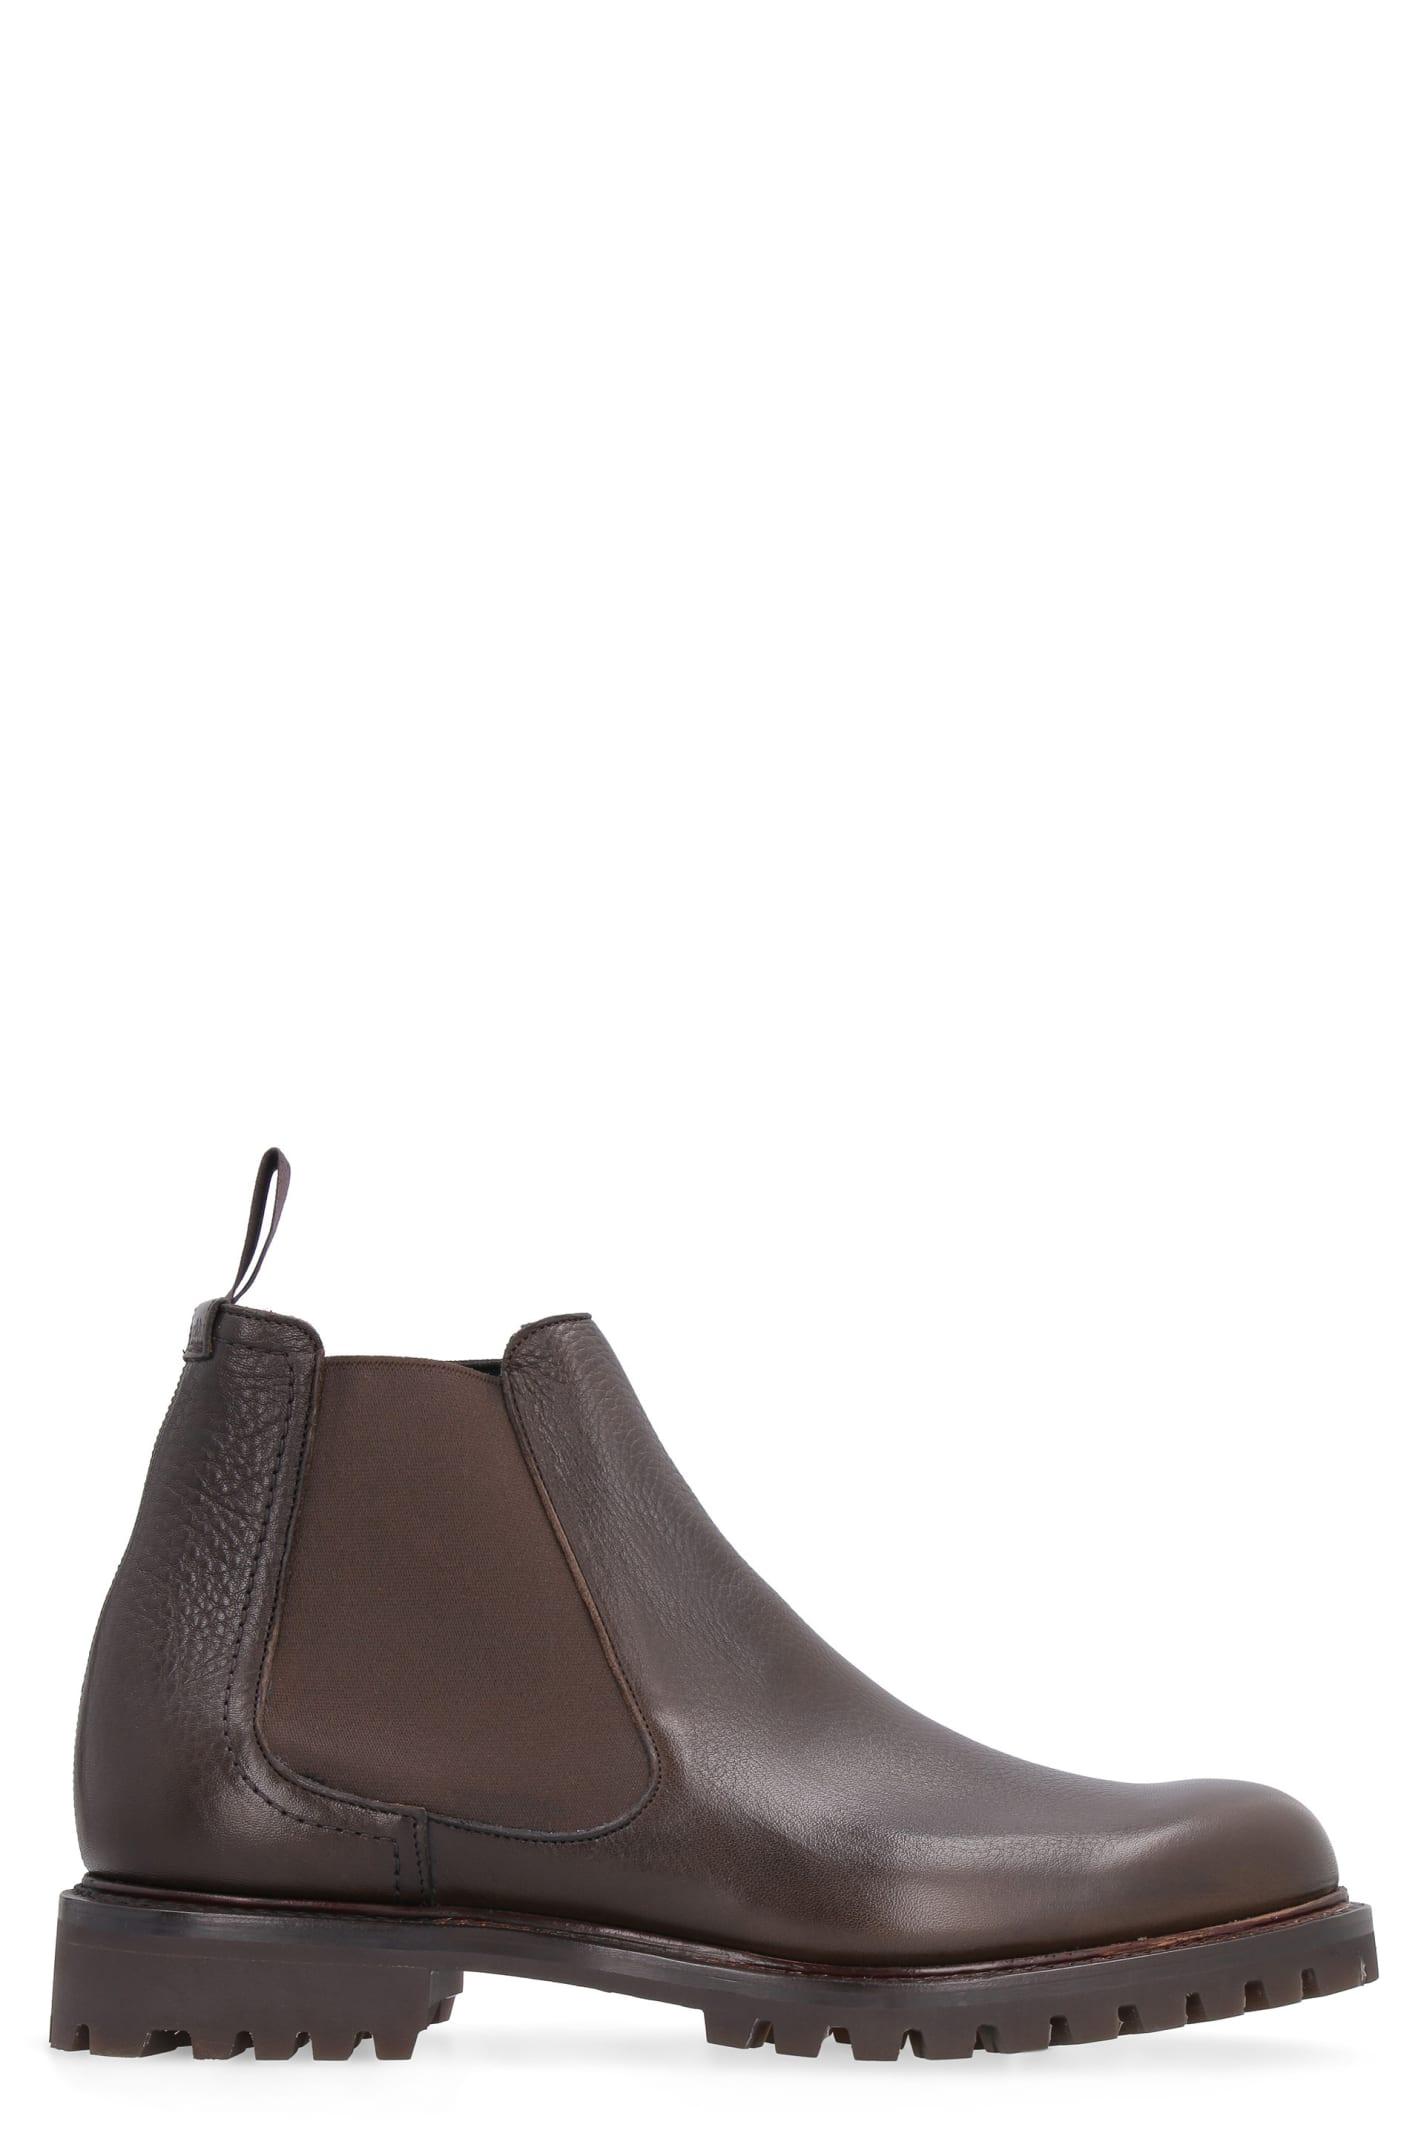 Churchs Cornwood Leather Chelsea Boots